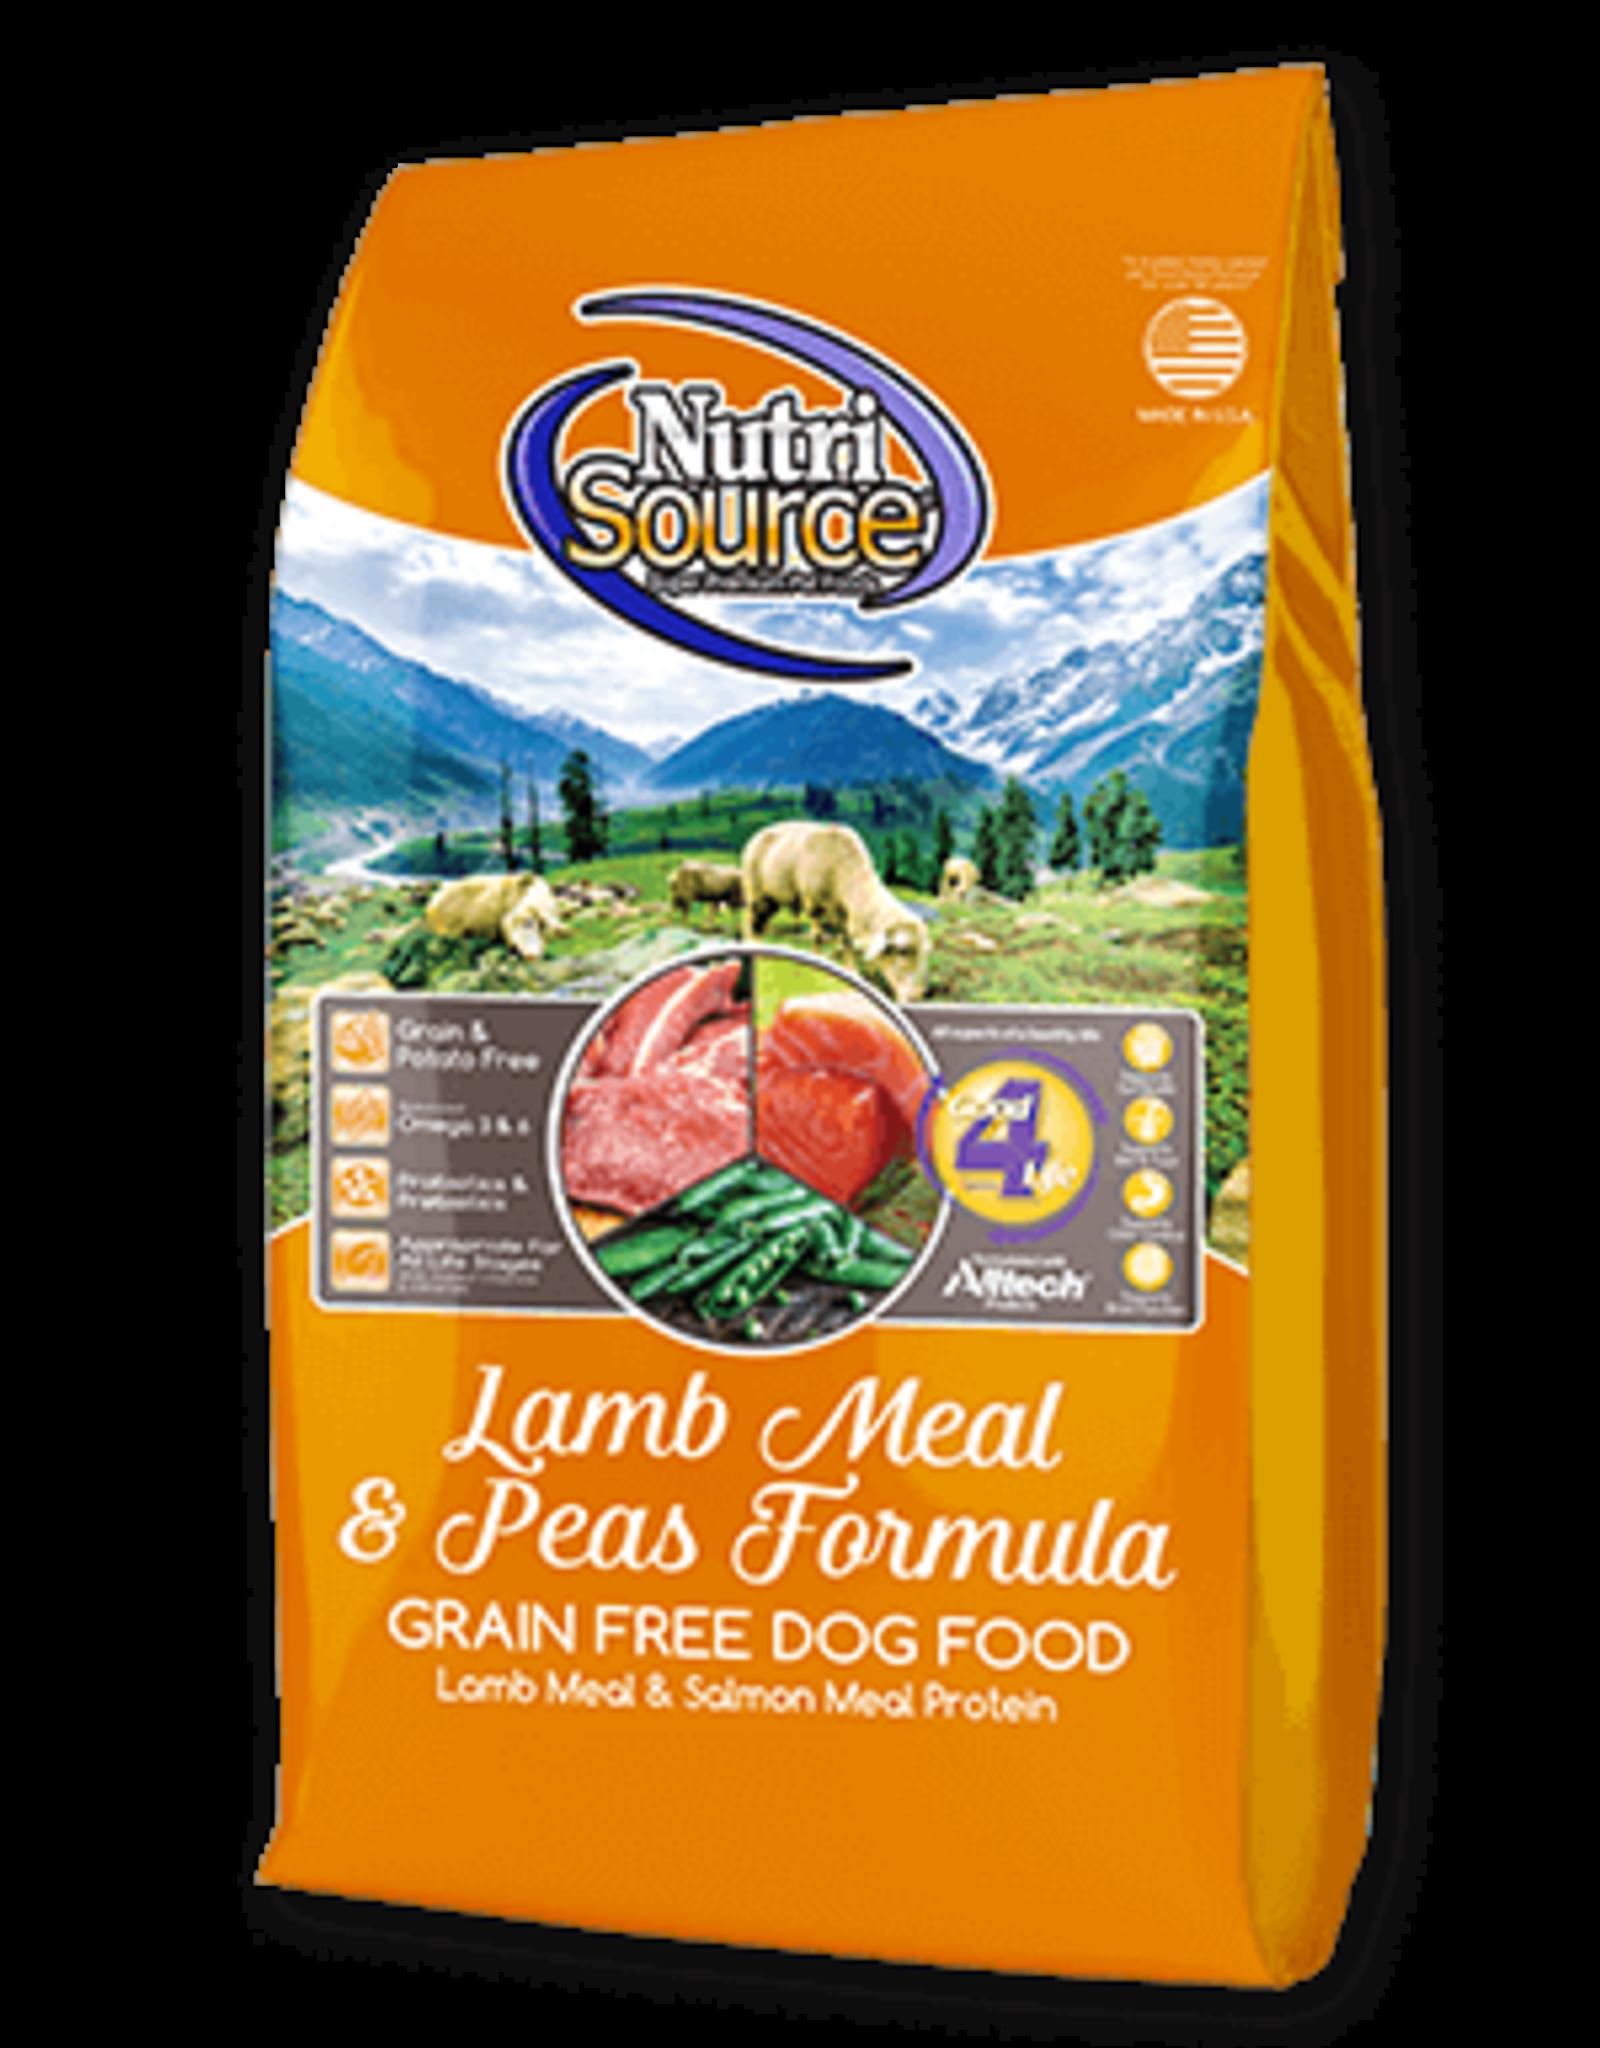 Nutrisource GF Dog Food Lamb Meal & Pea